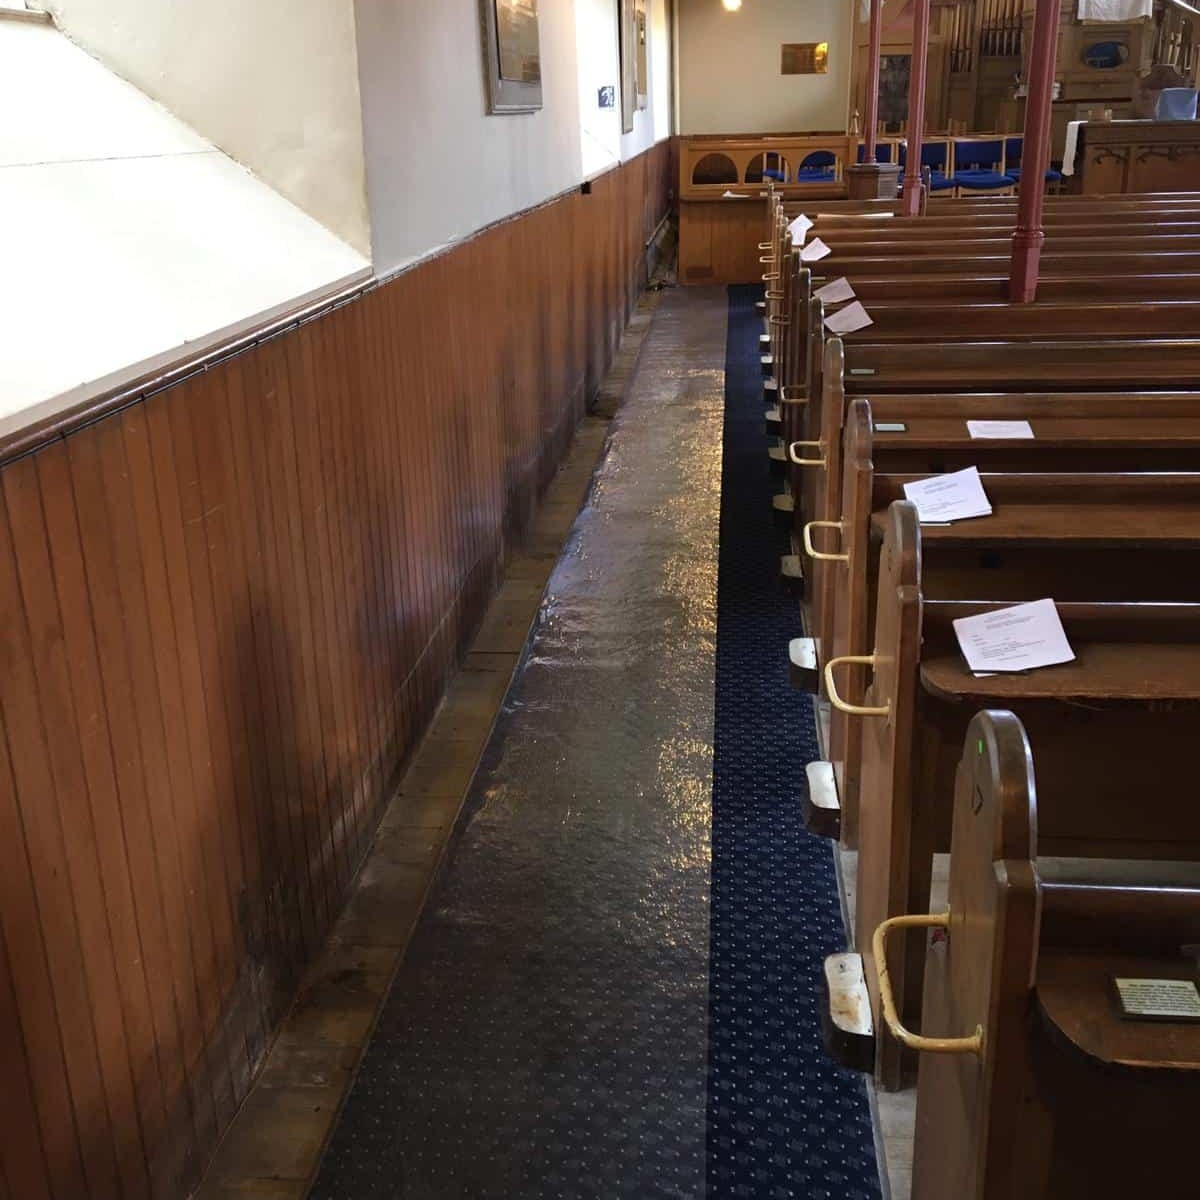 Photos from Bishopton Parish Church heating system 15